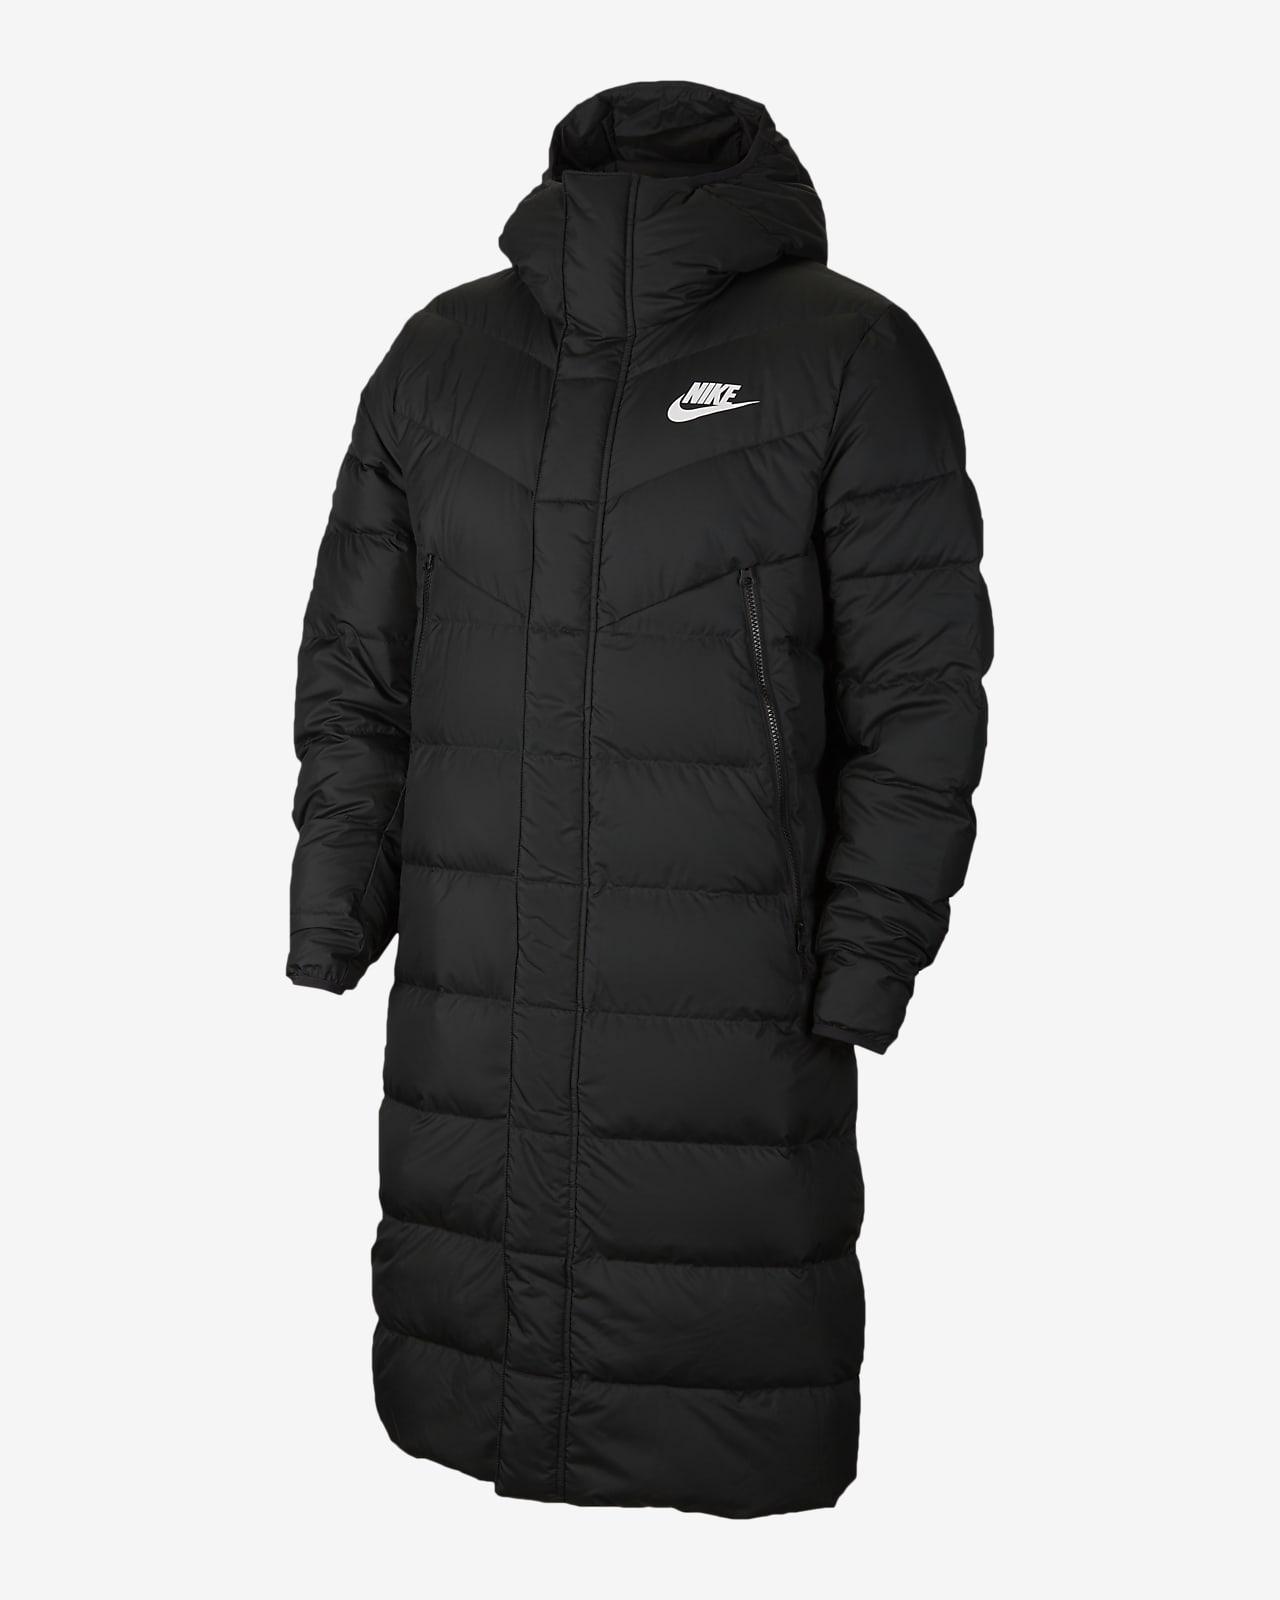 Parka con capucha para hombre Nike Sportswear Down Fill Windrunner